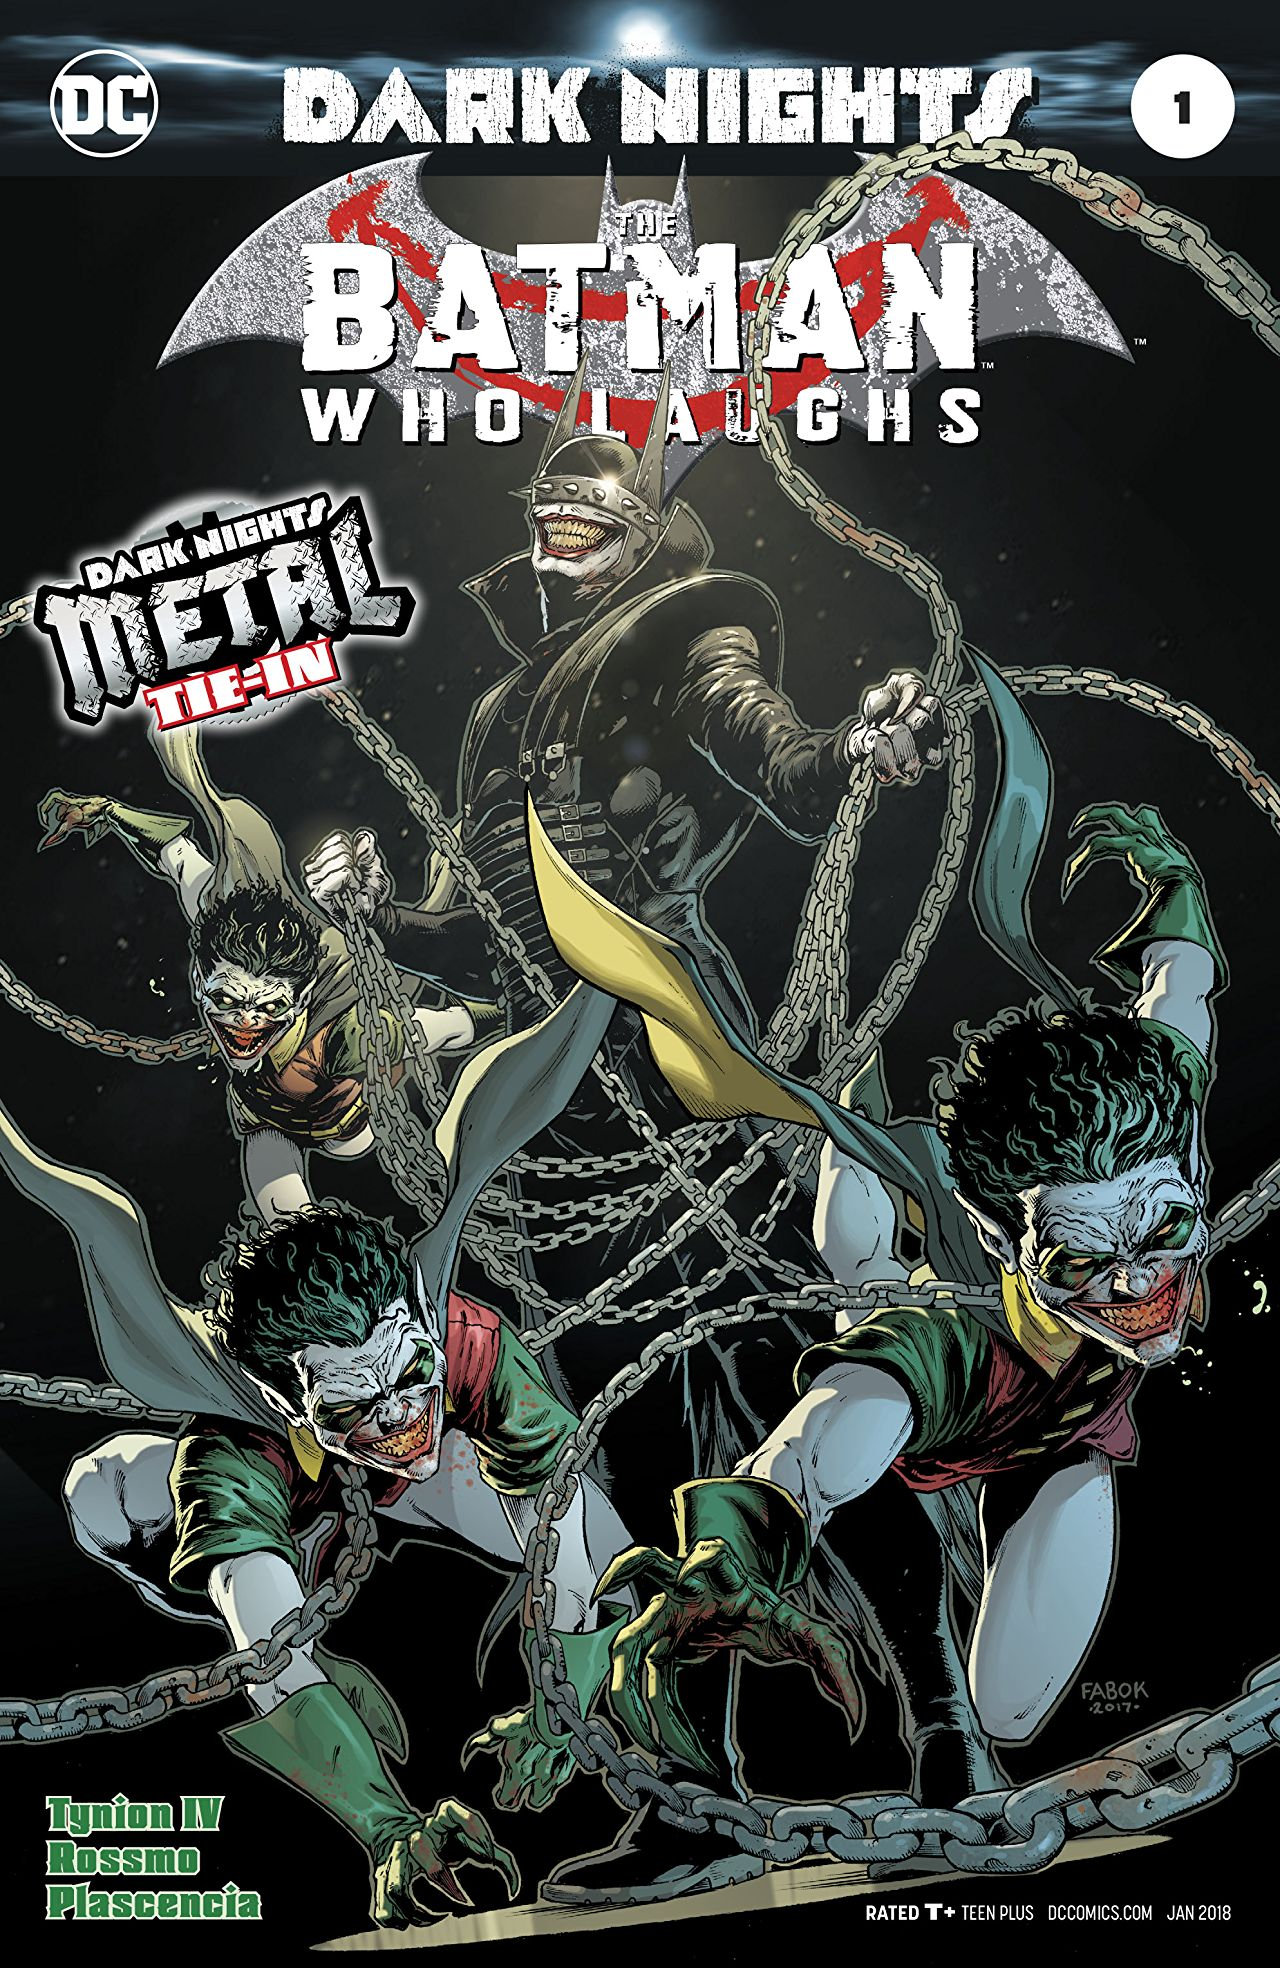 The_Batman_Who_Laughs_Vol_1_1.jpg